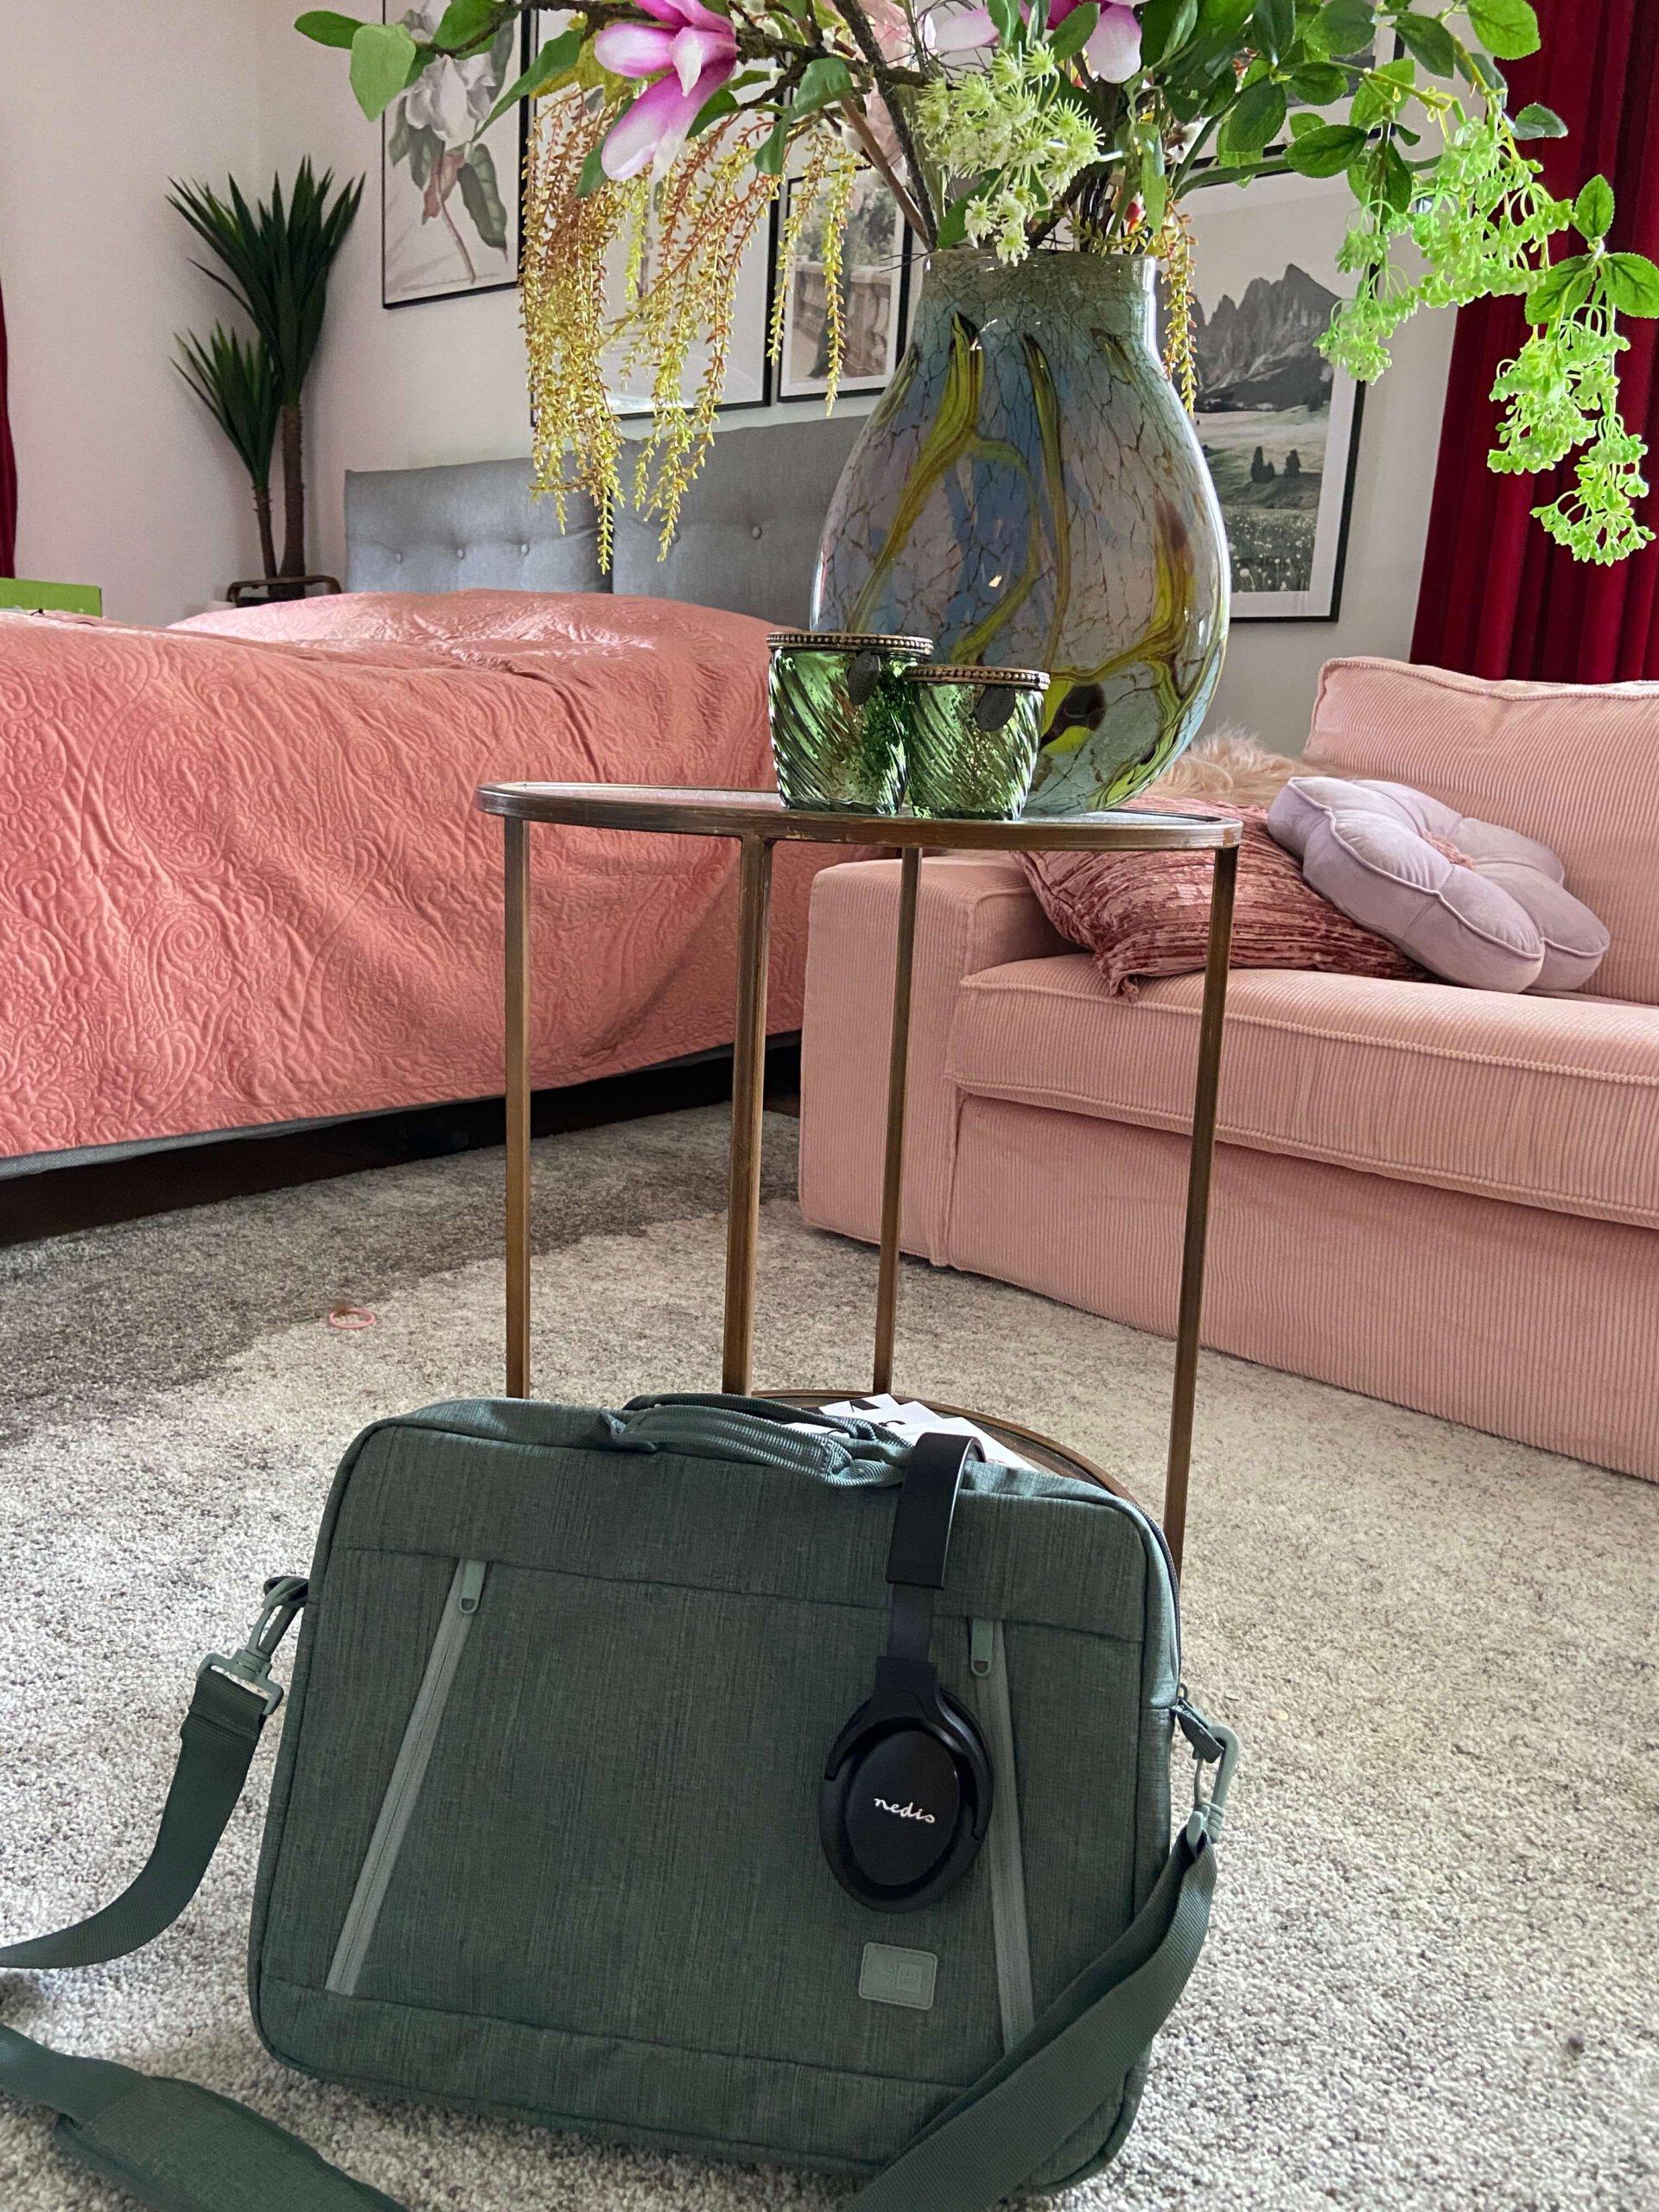 Case logic laptoptas, Thuiswerken, thuiswerkplek, thuiswerk tips